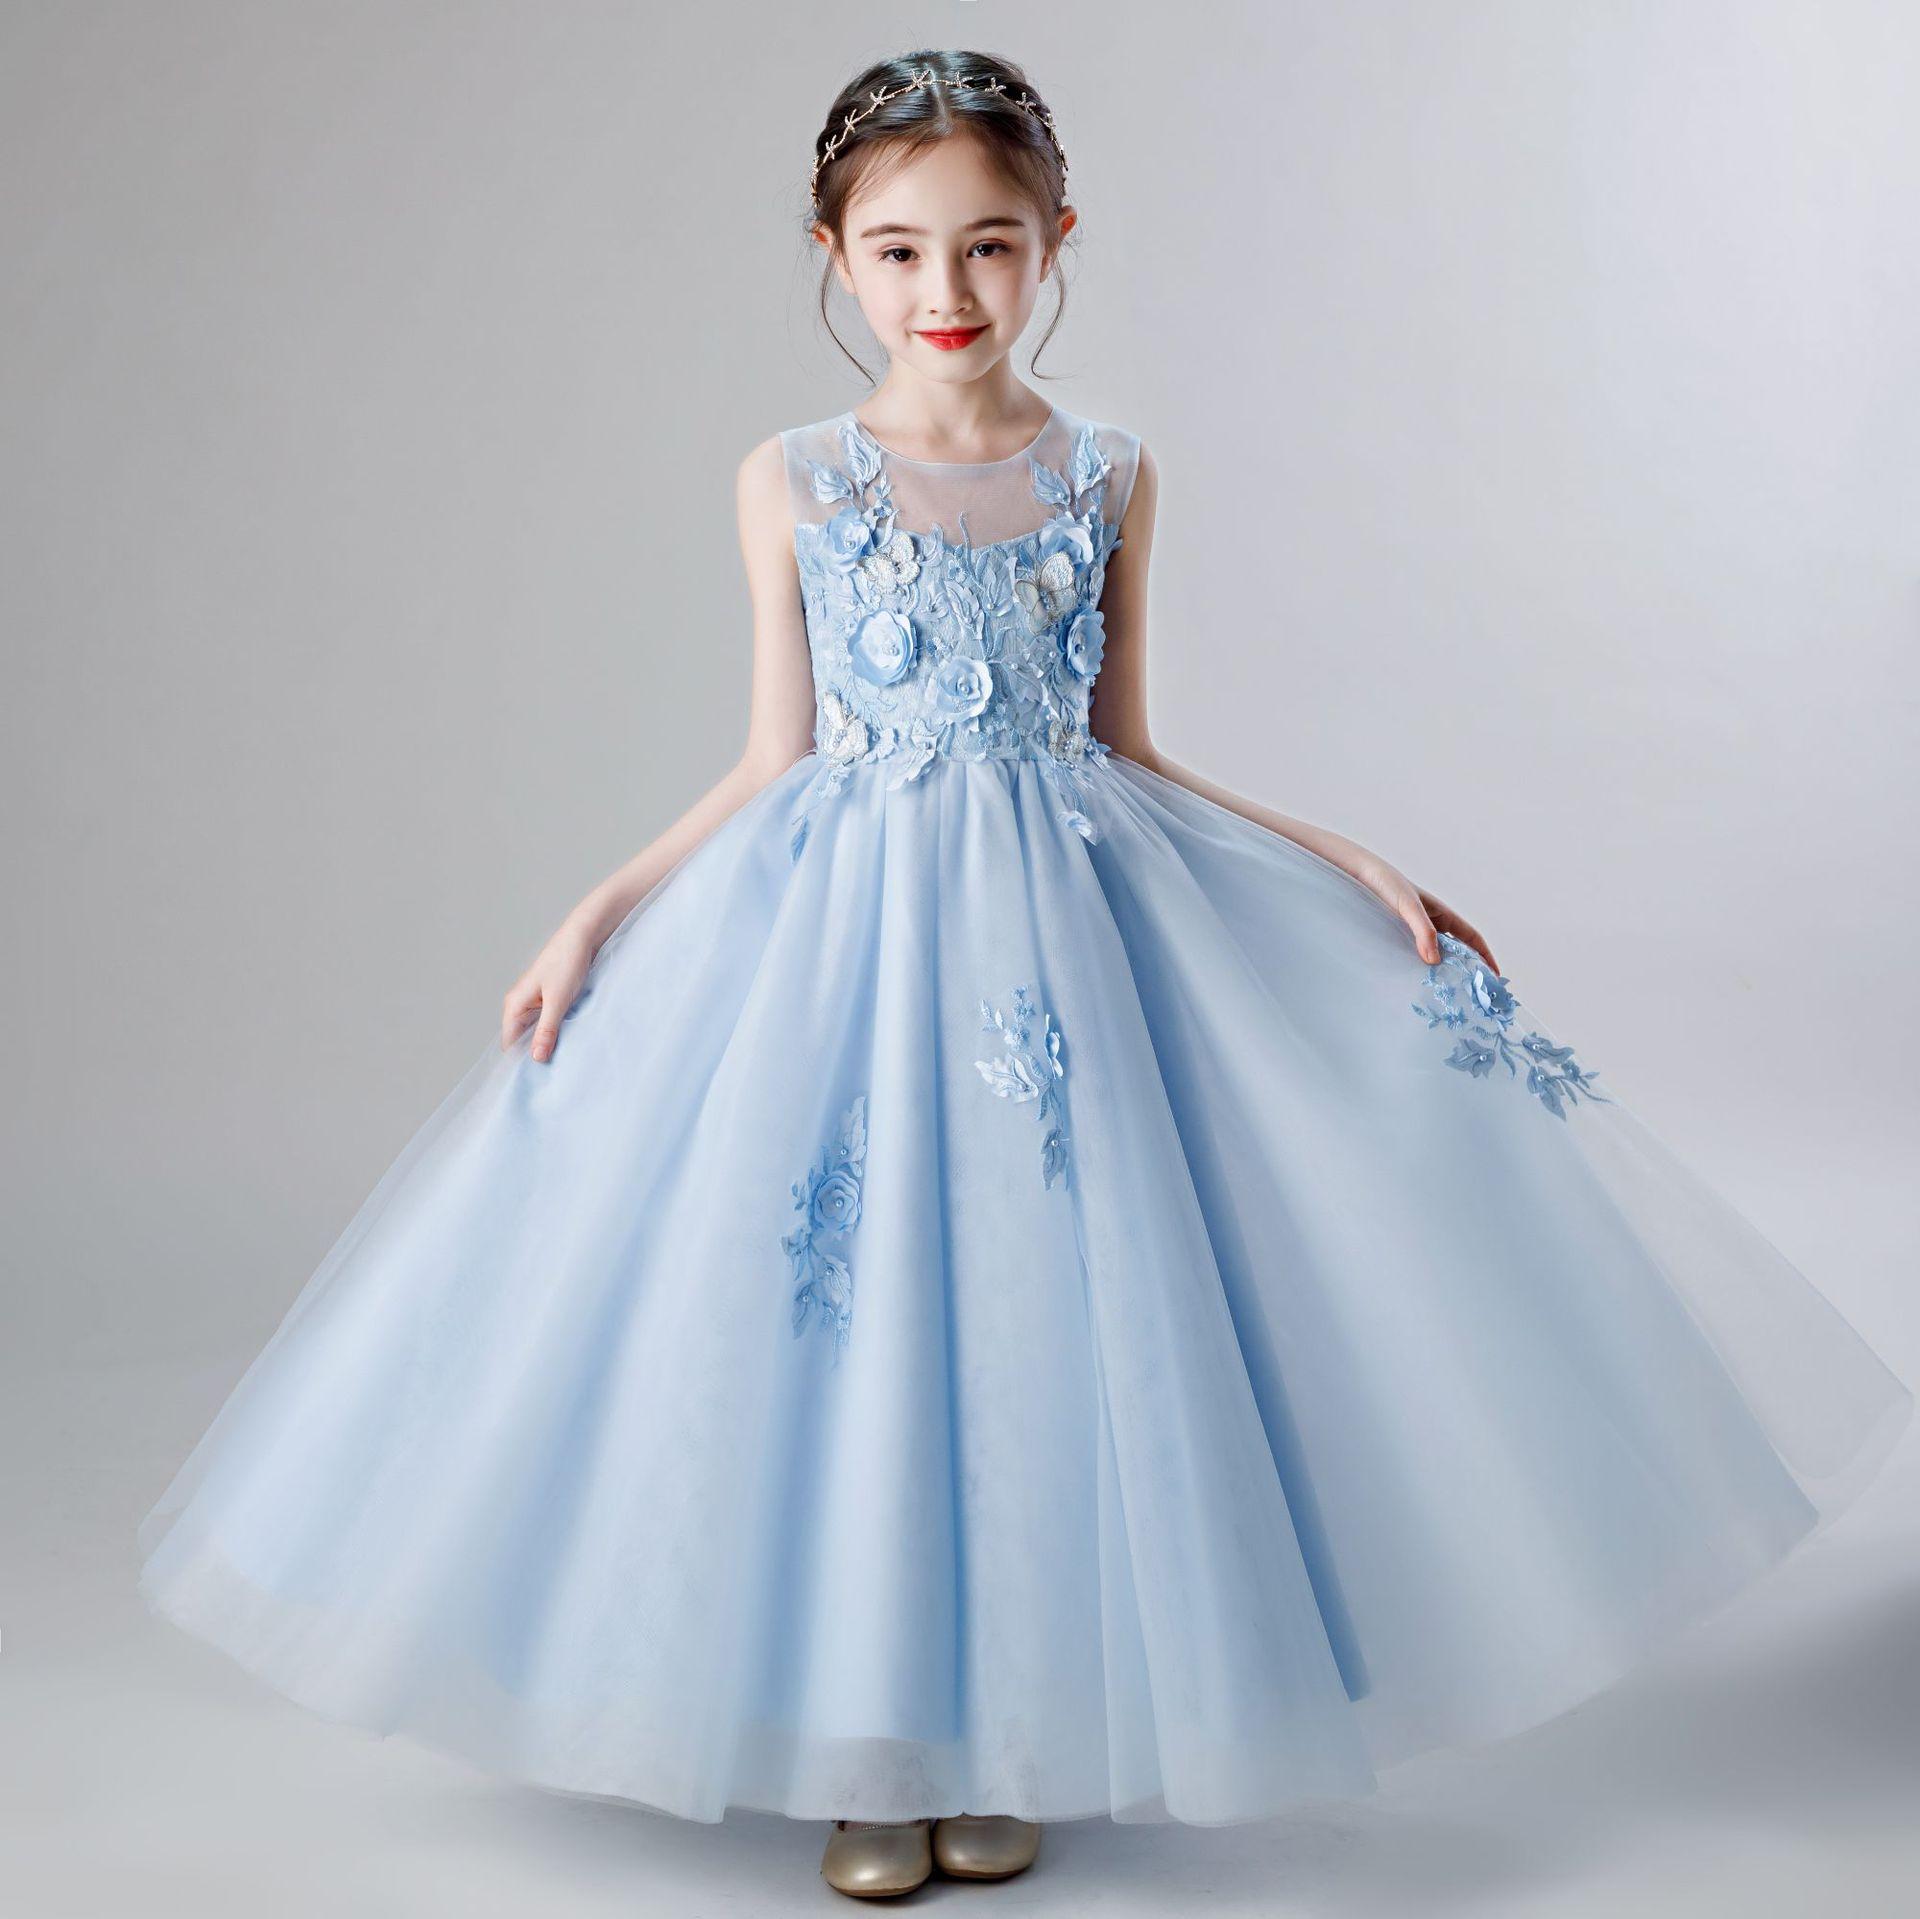 Gril's Dress Summer New Style CHILDREN'S Dress Princess Dress Girls' Long Skirt Western Style Puffy Yarn Baby Girls Skirt